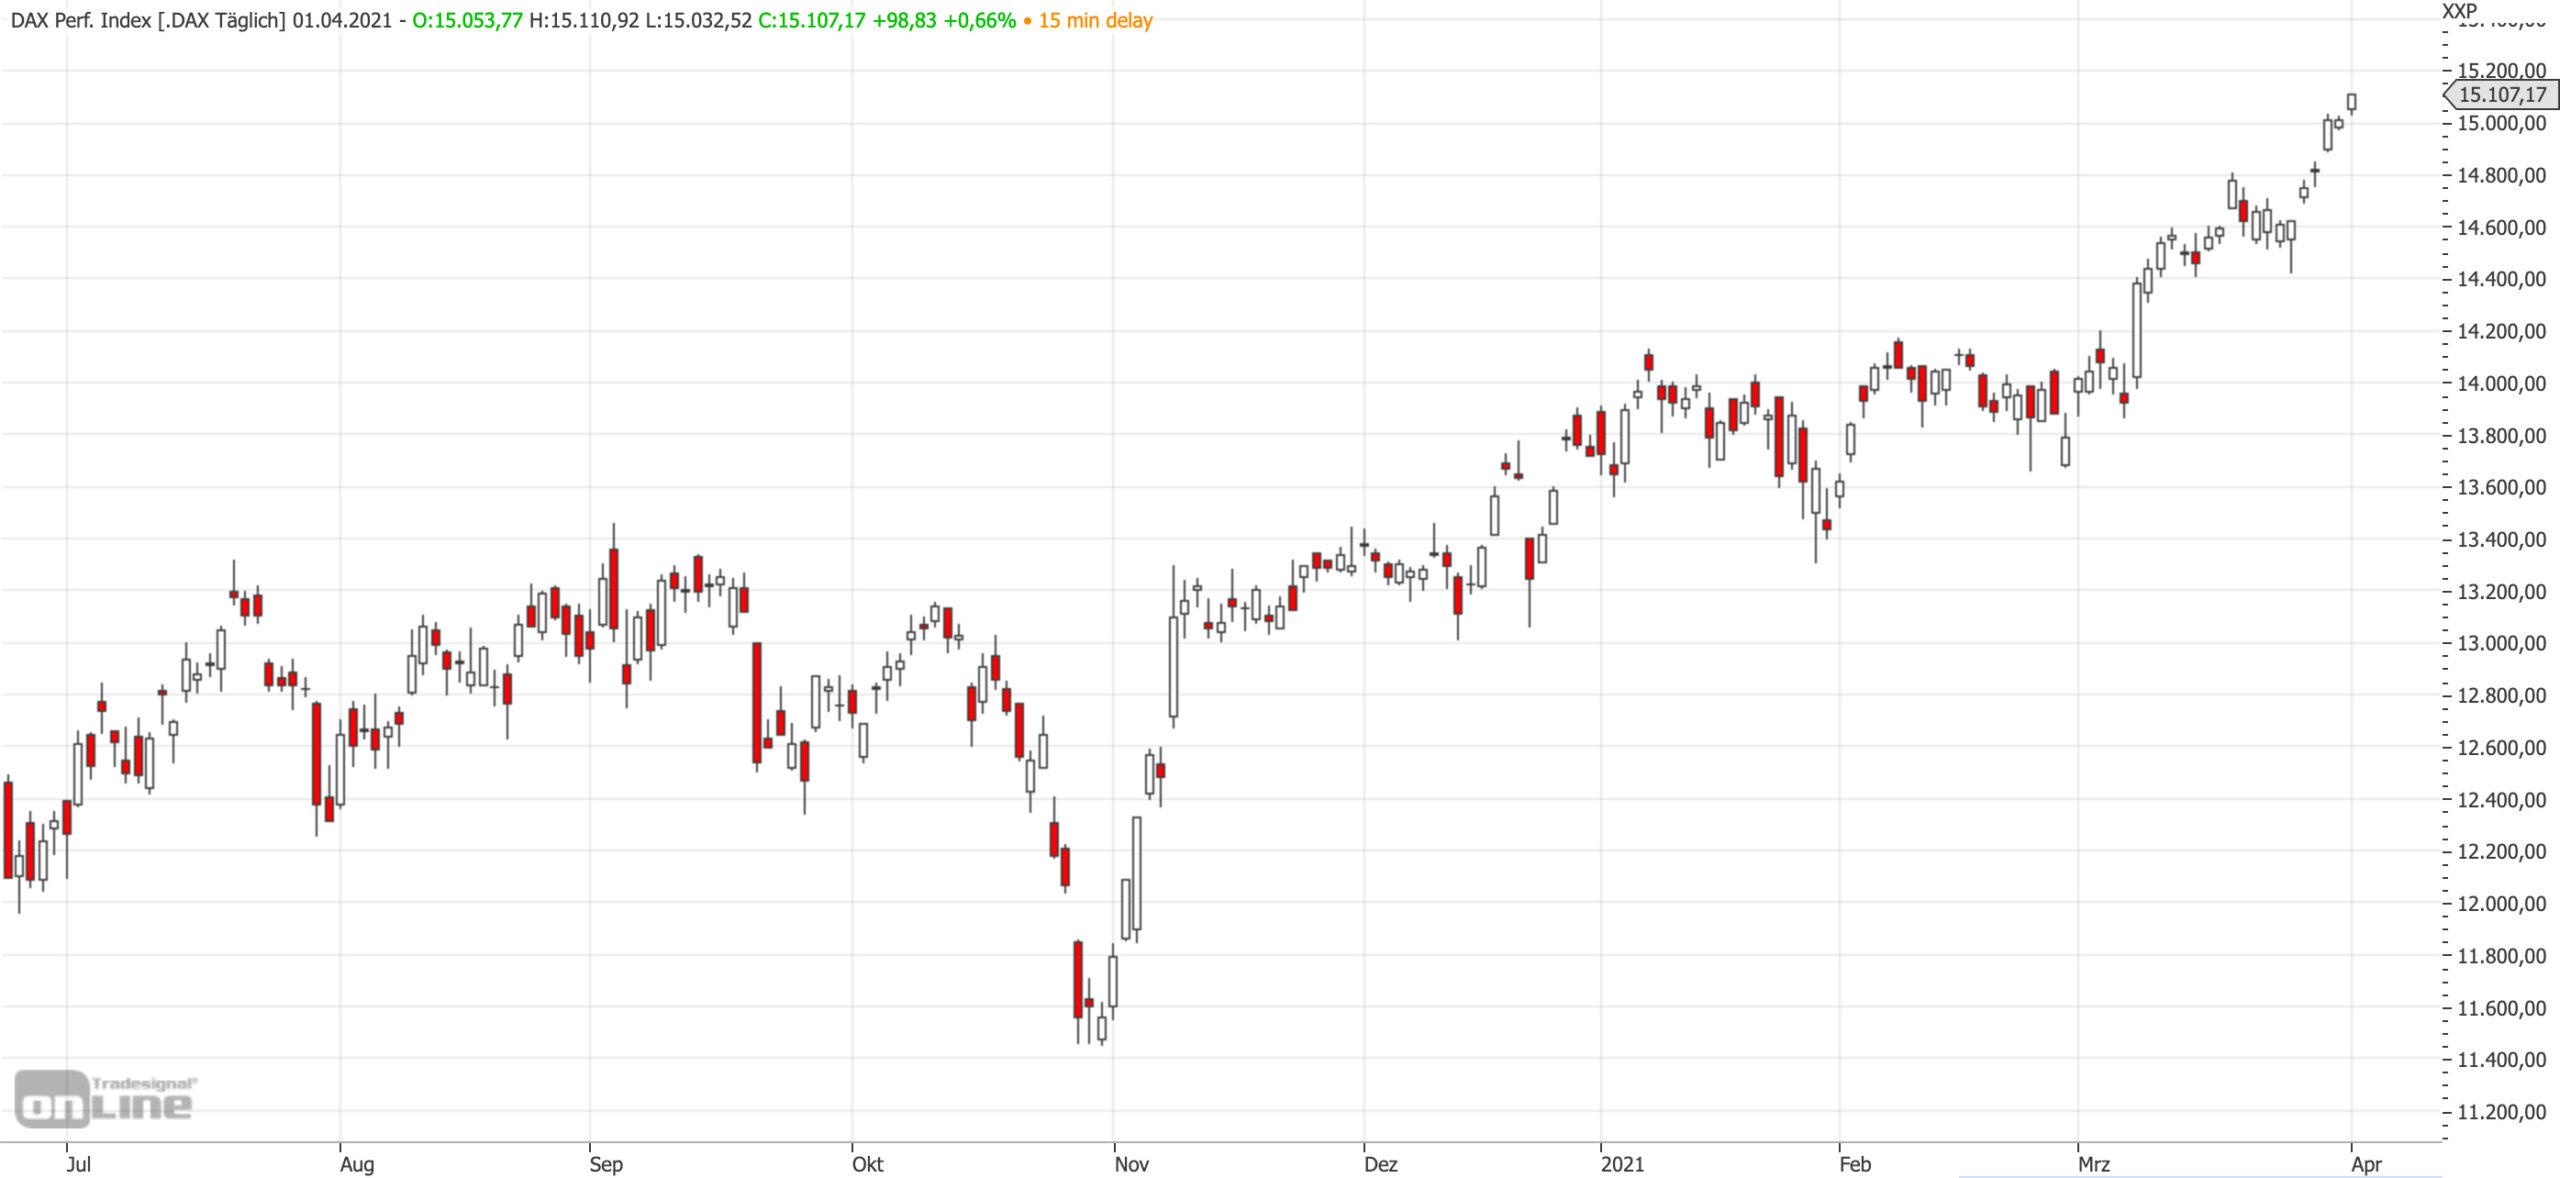 Mittelfristiger DAX-Chart am 01.04.2021